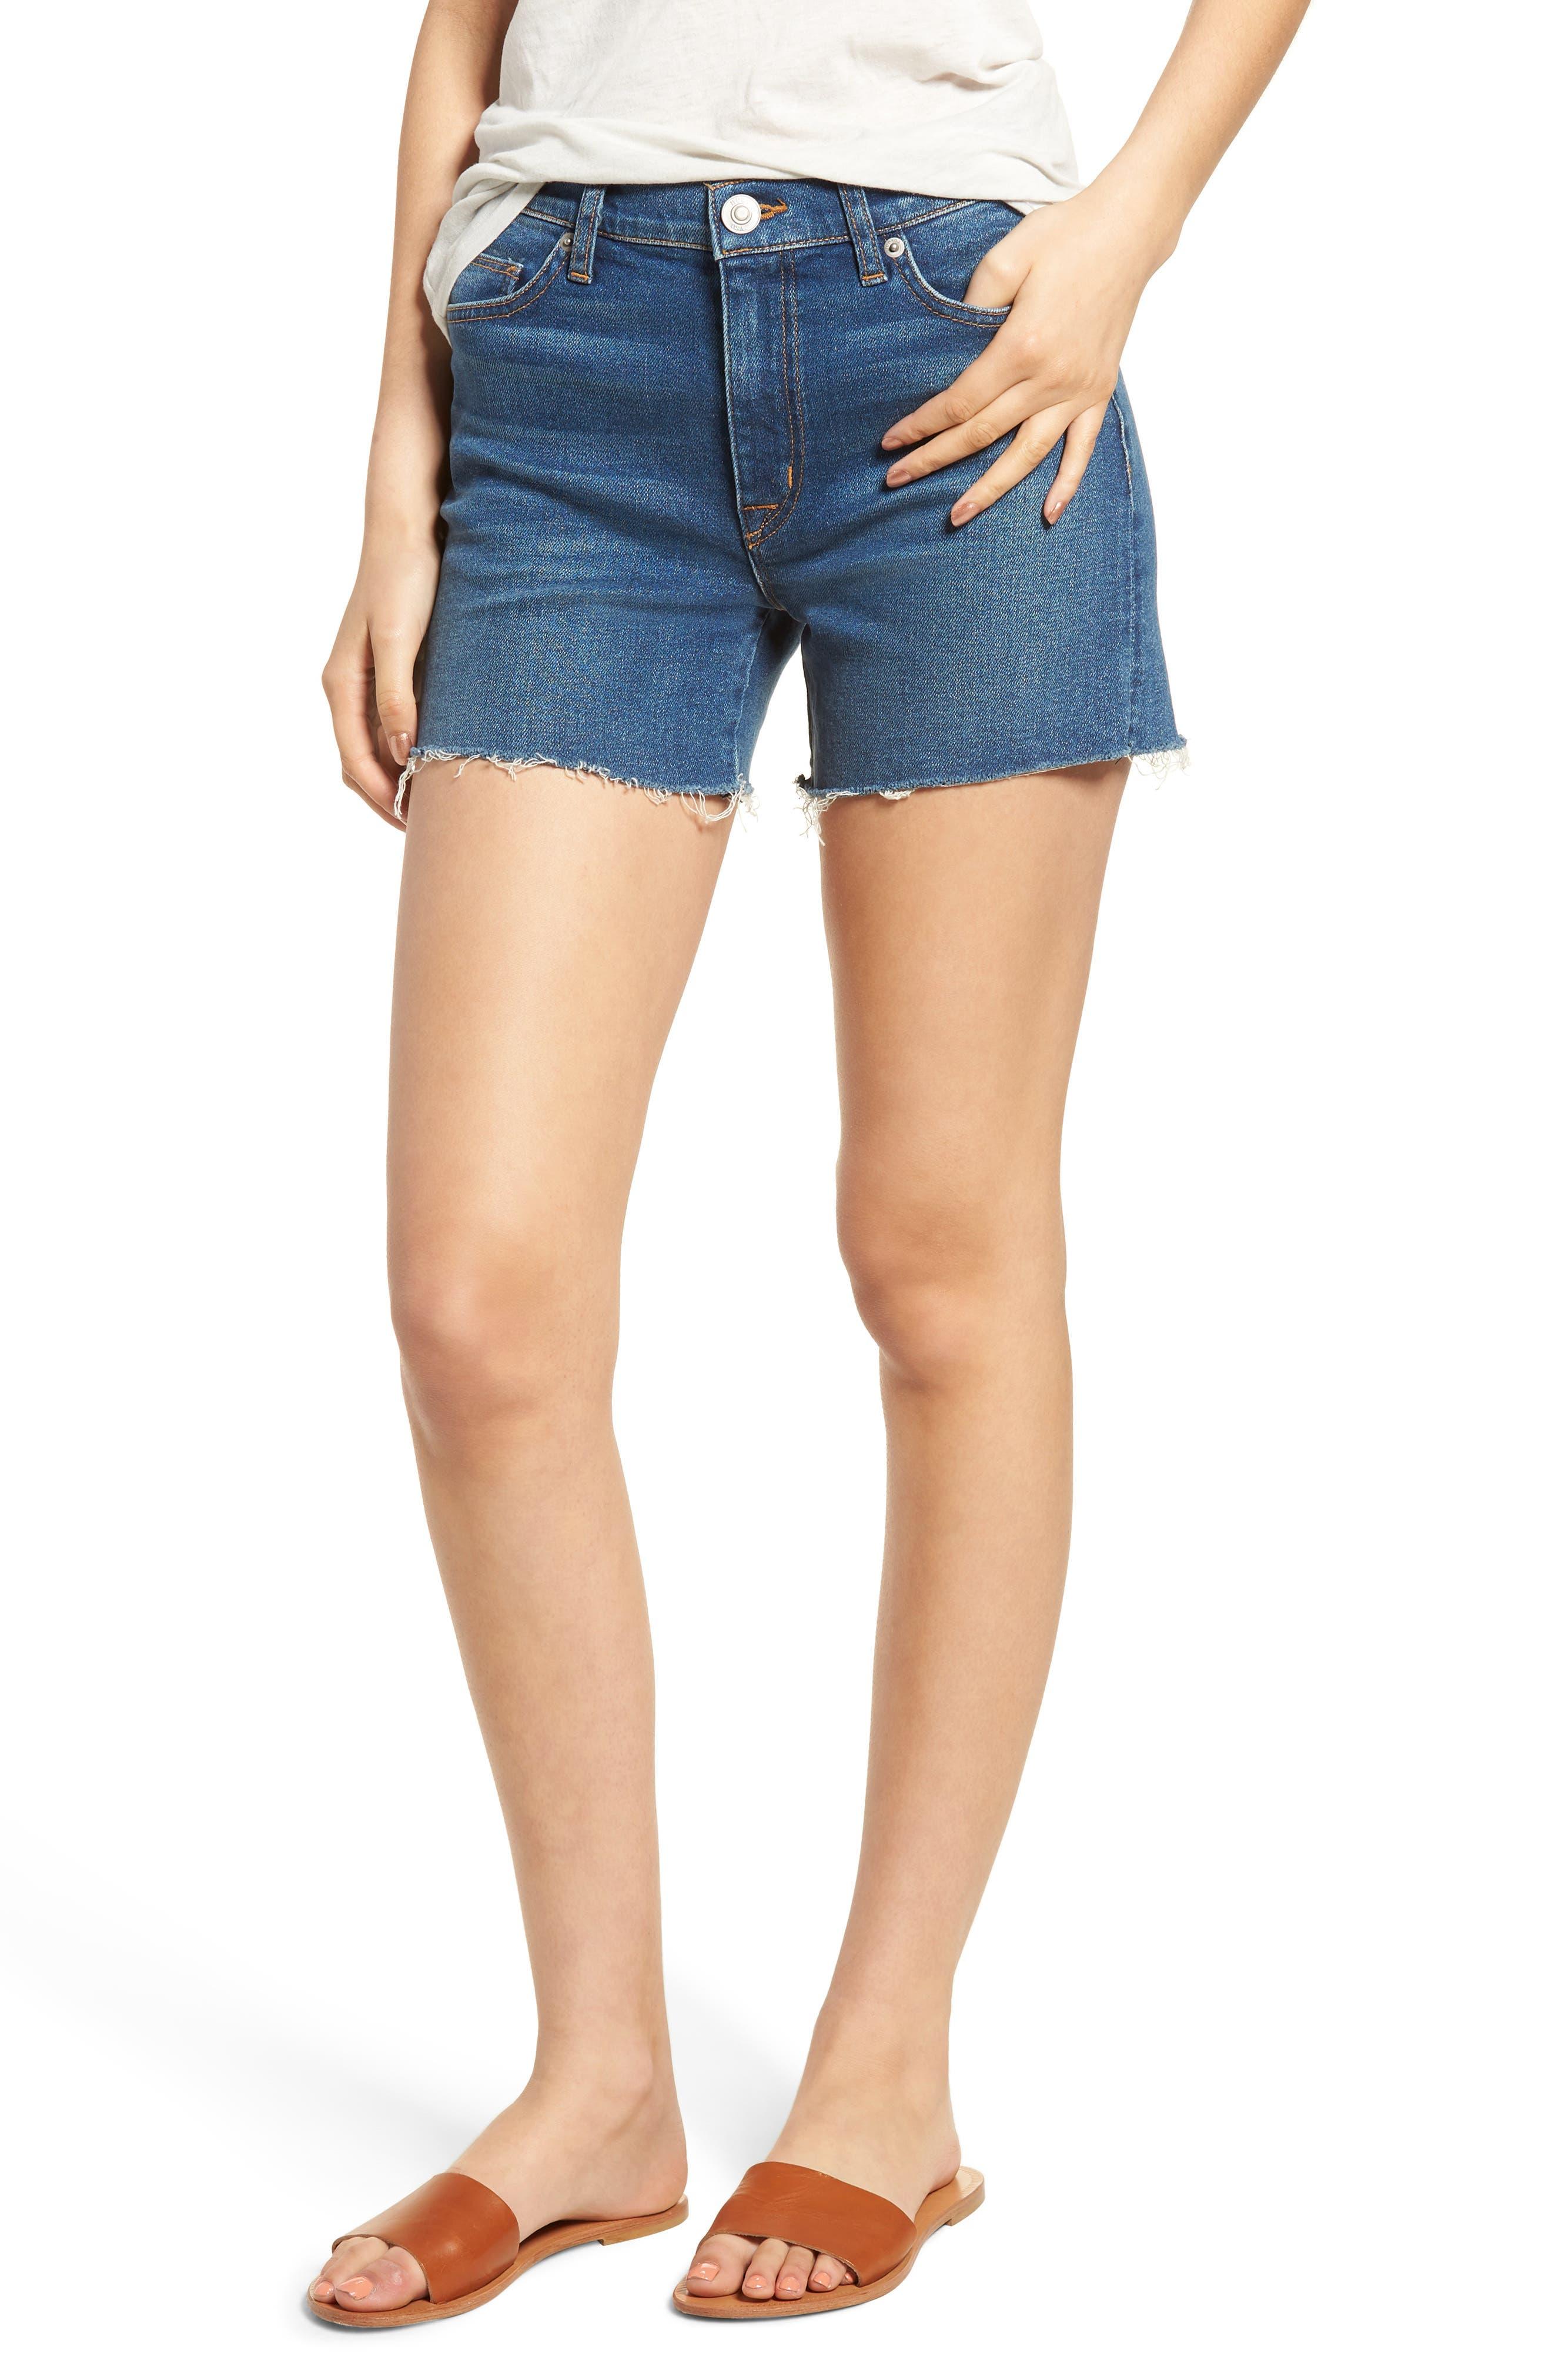 Valeri Cutoff Denim Shorts,                         Main,                         color, 421